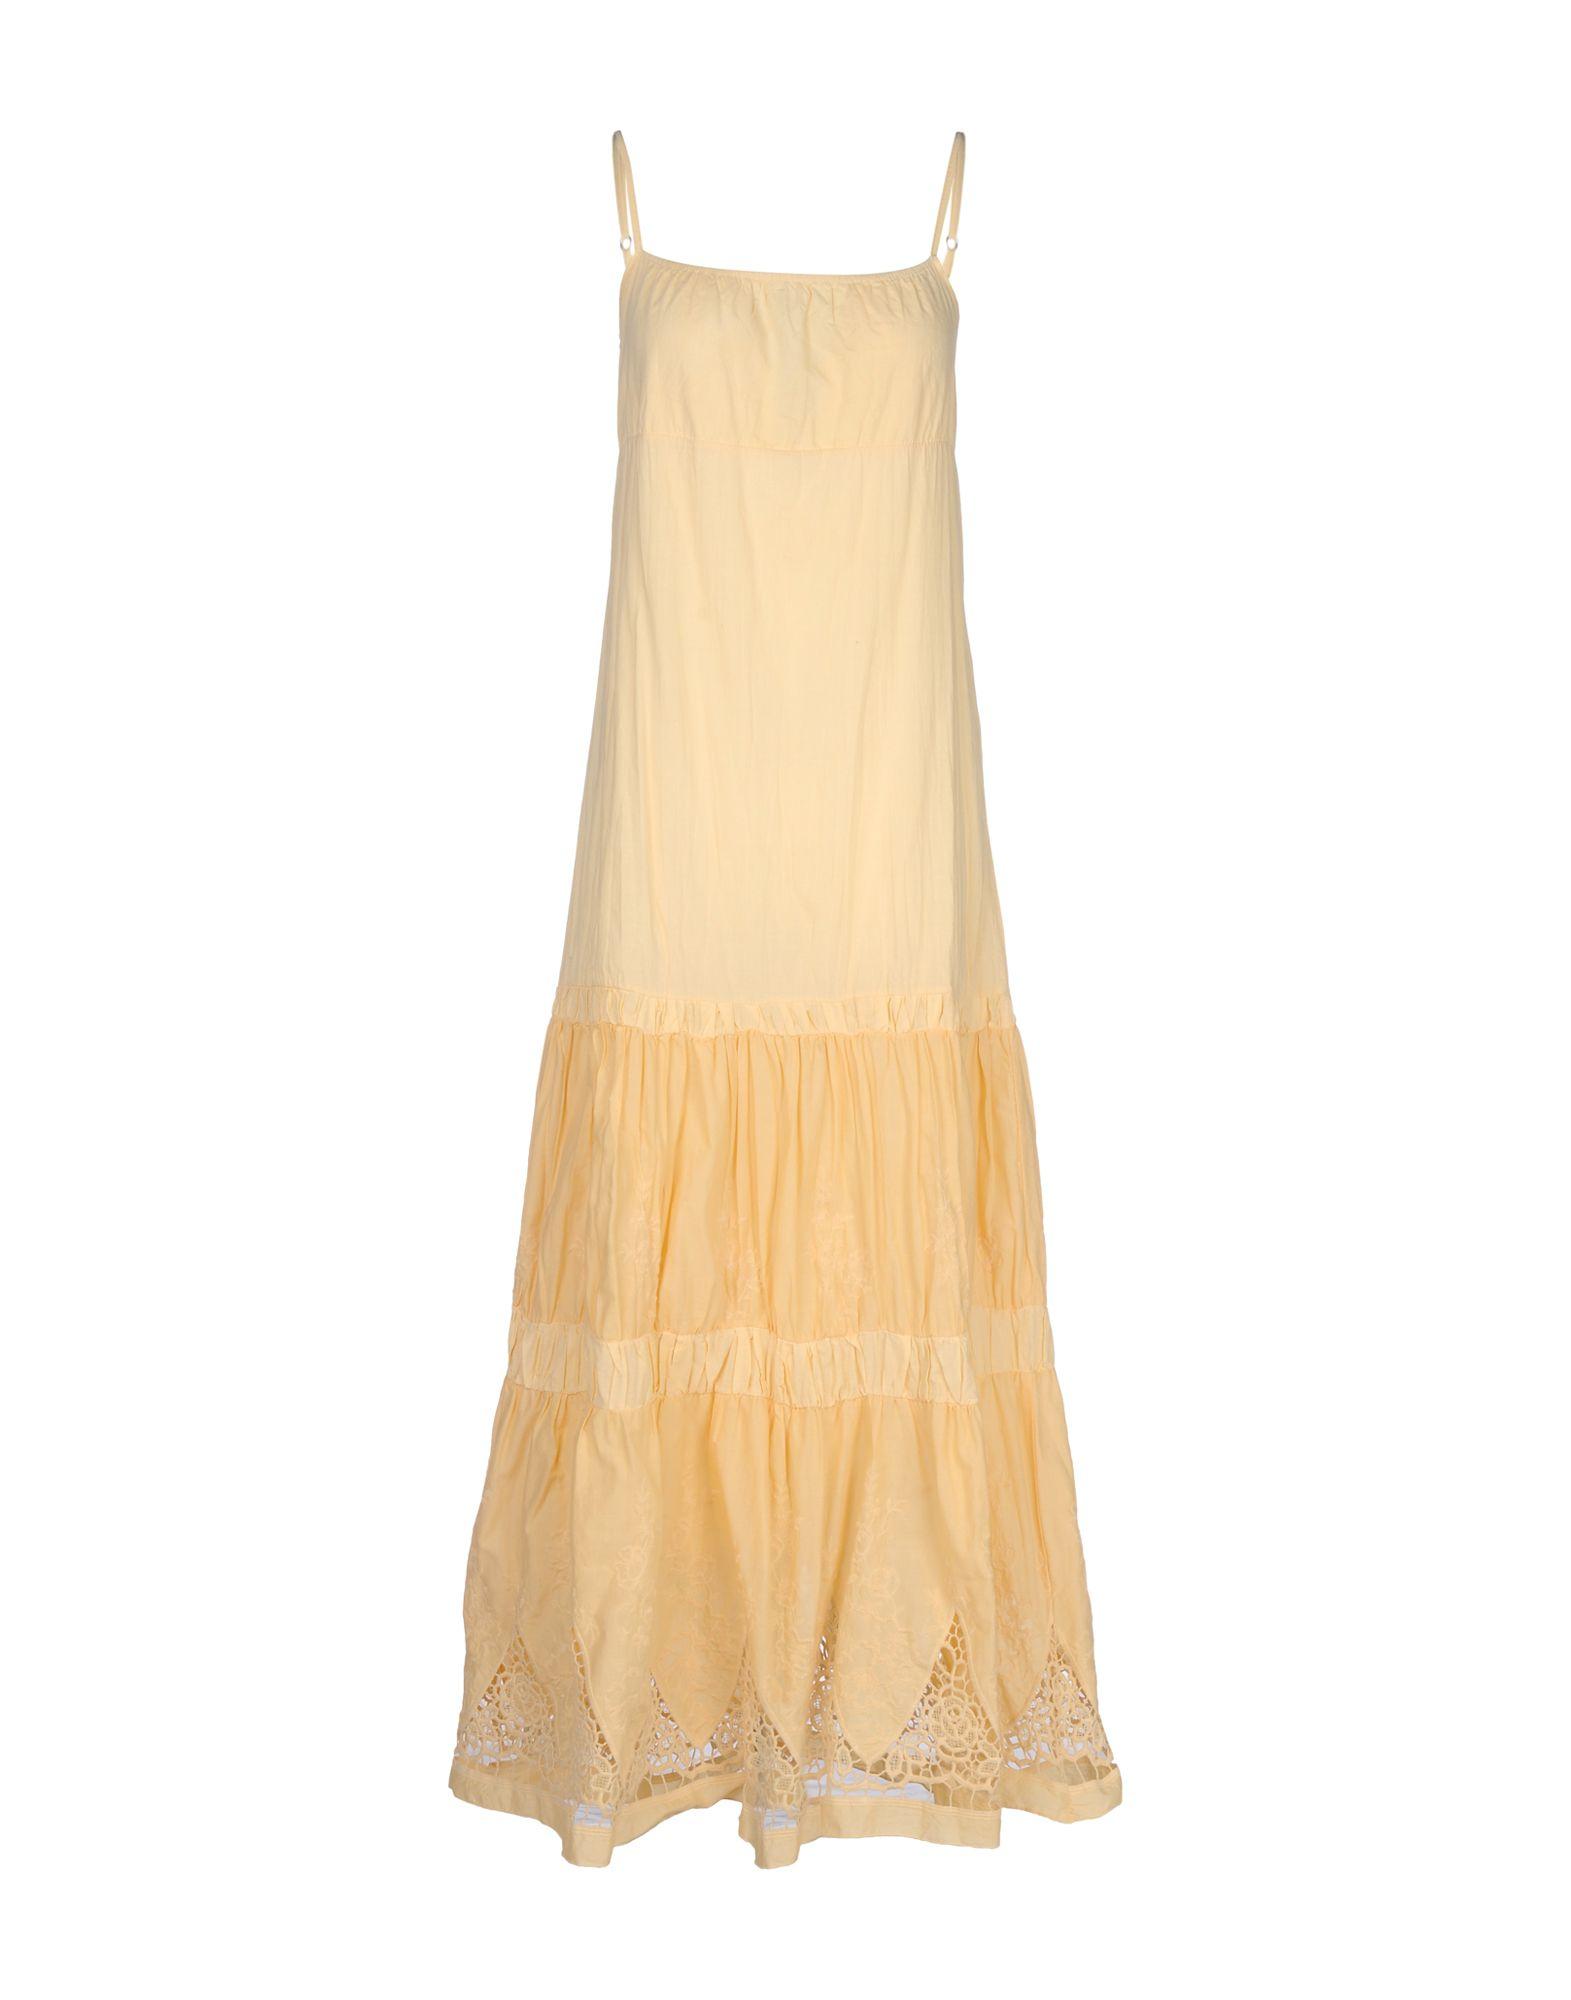 JEI O' Long dresses